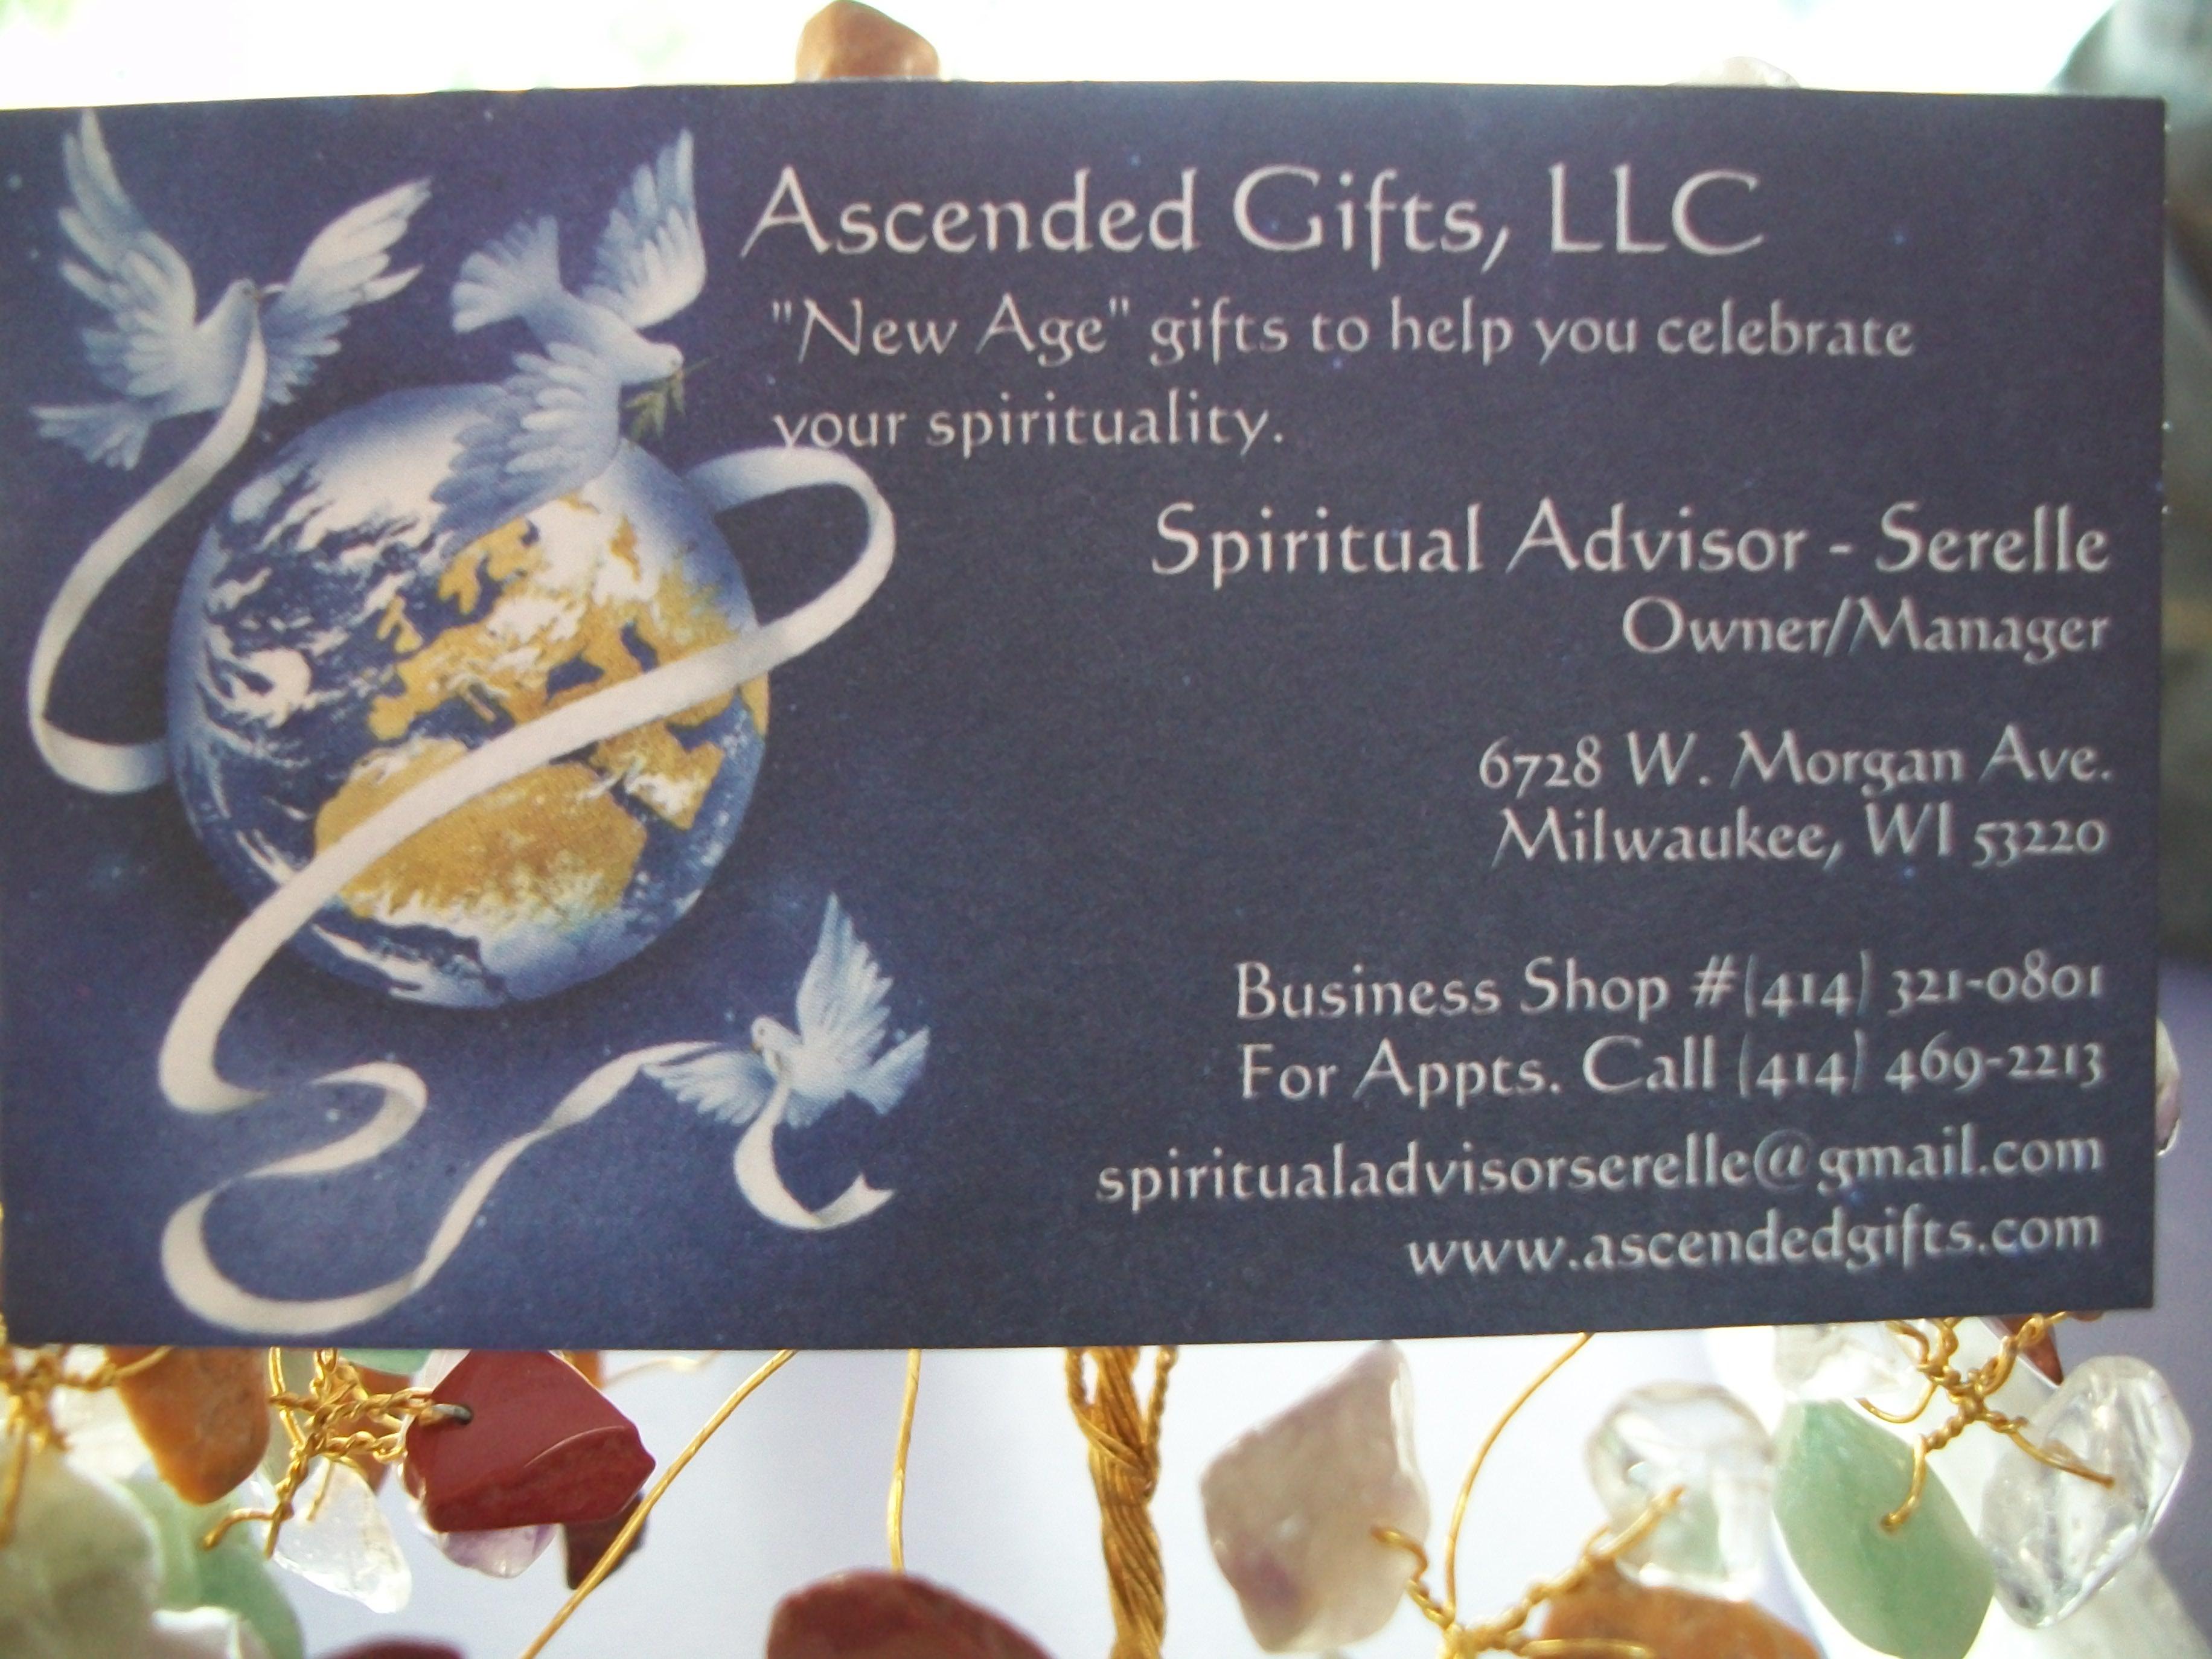 Ascended Gifts, Llc